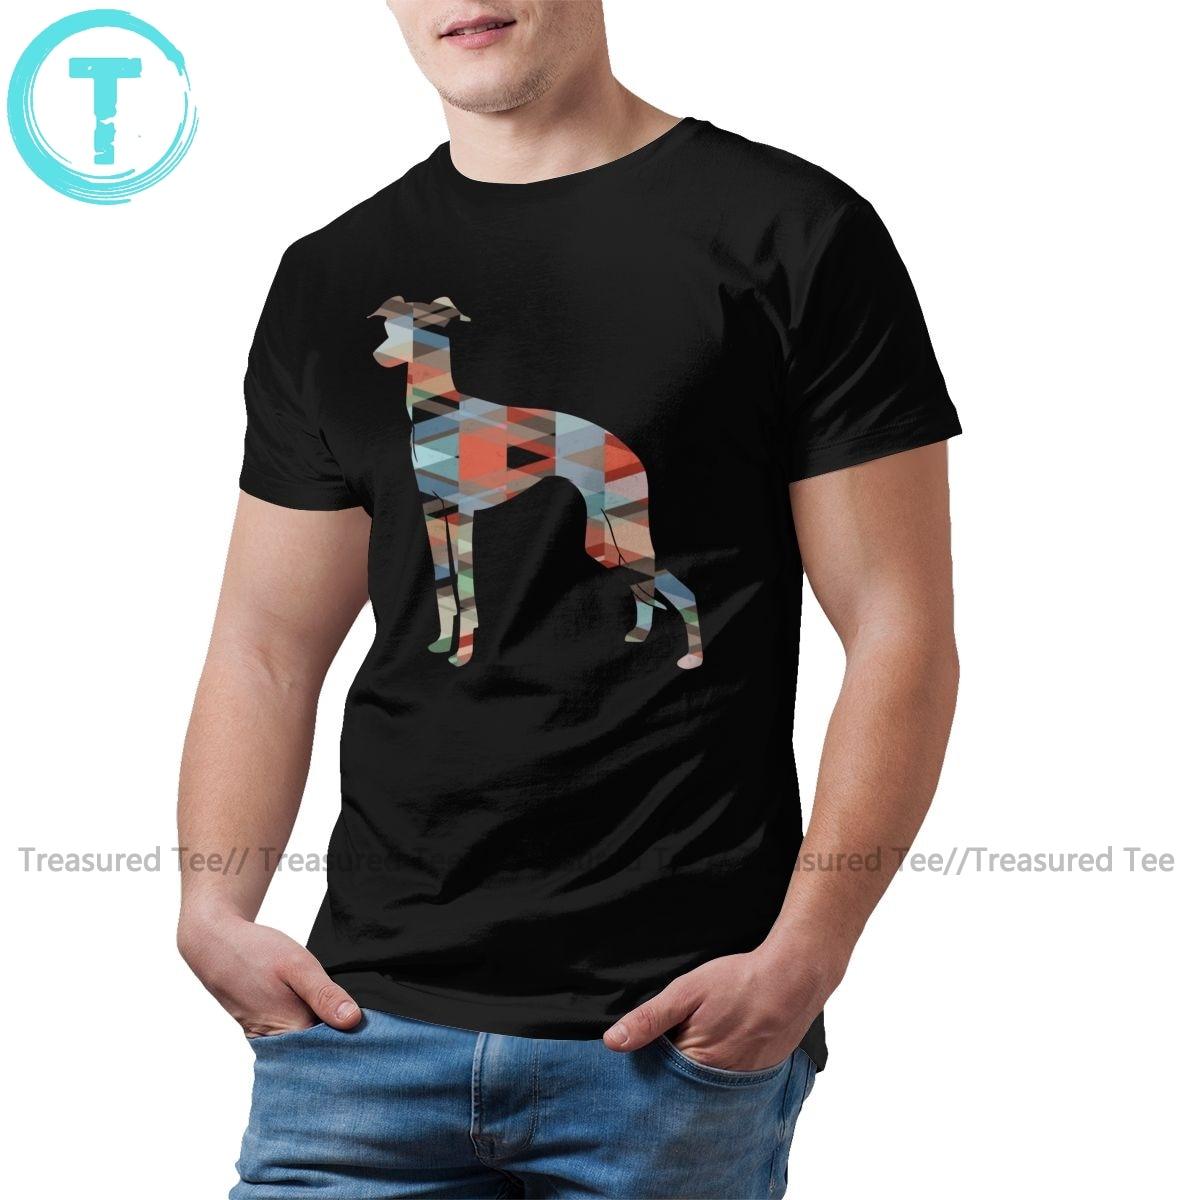 Левретка футболка с геометрическим узором силуэт Футболка A 100 процентов хлопковая футболка «Человек 4xl Футболка